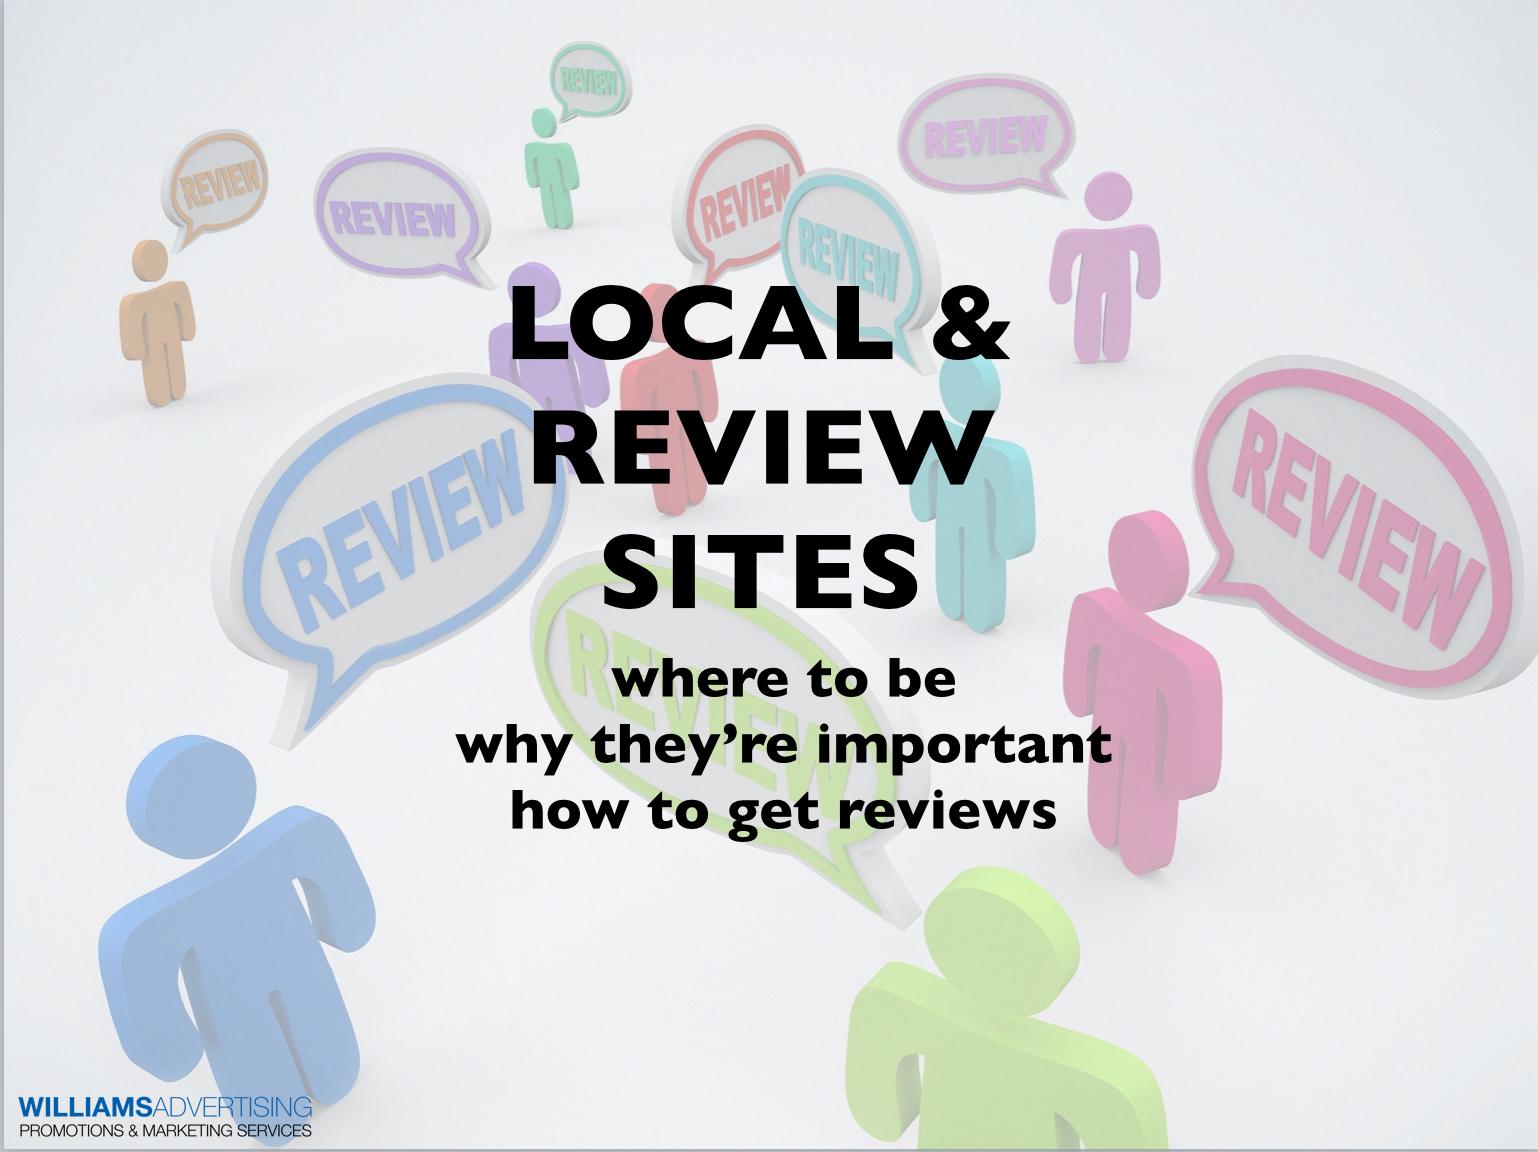 LocalandReviewSitesWilliamsAdvertising